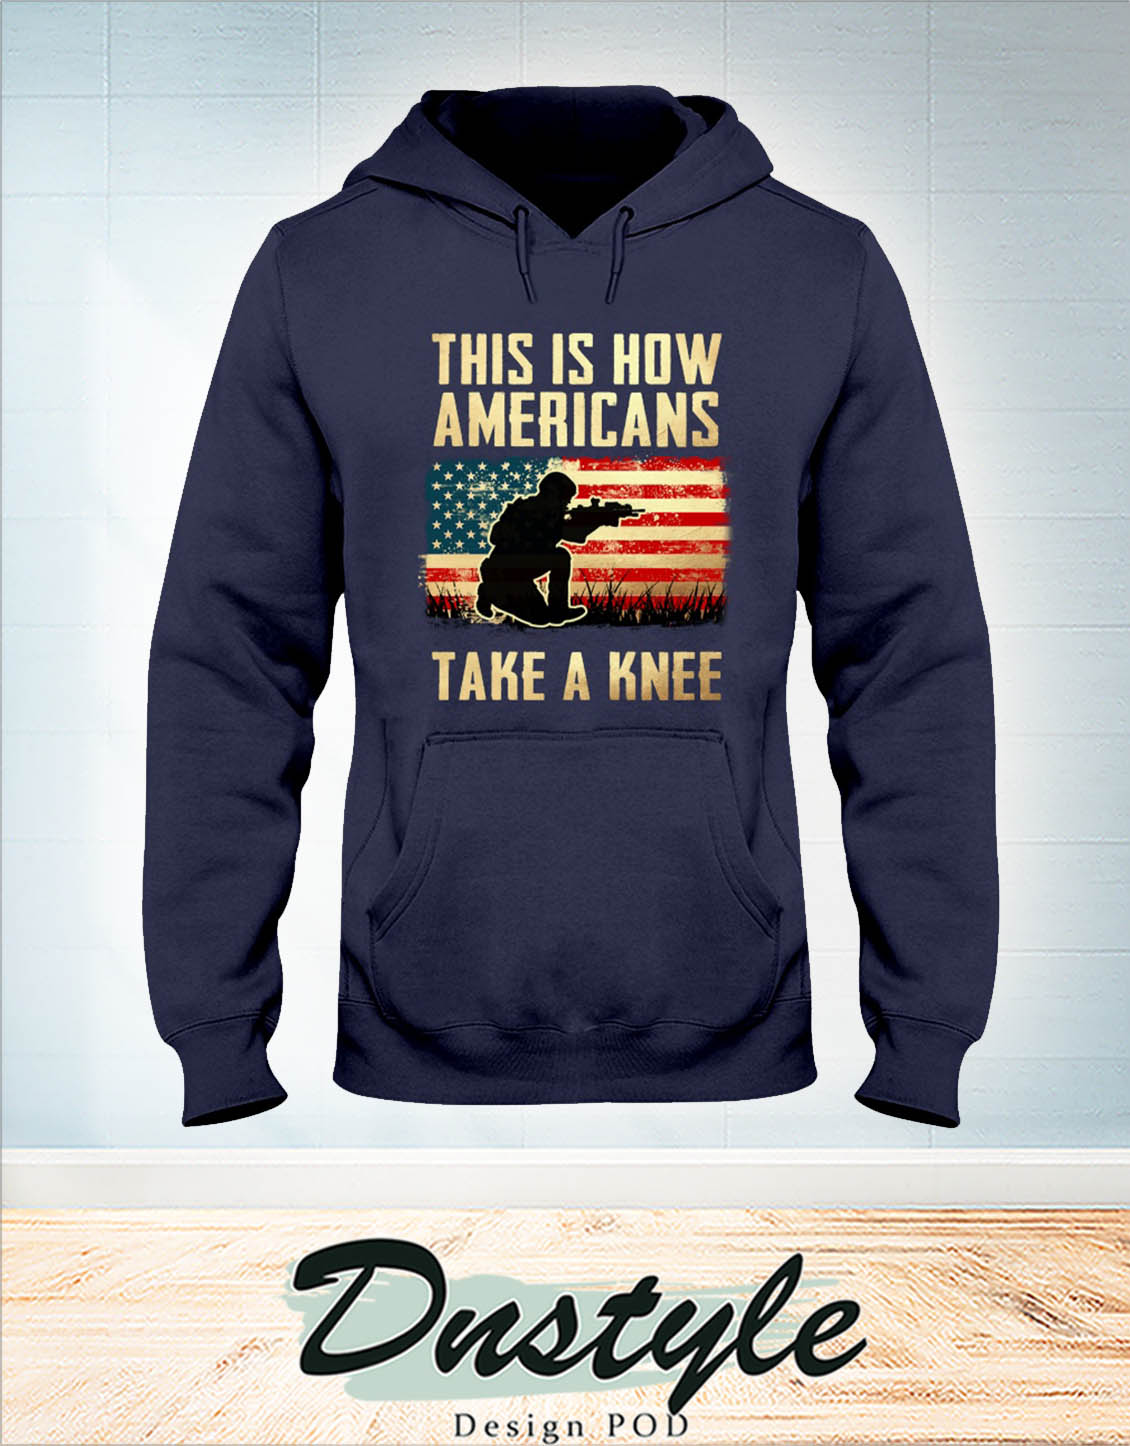 Soldier this is how americans take a knee american flag hoodie